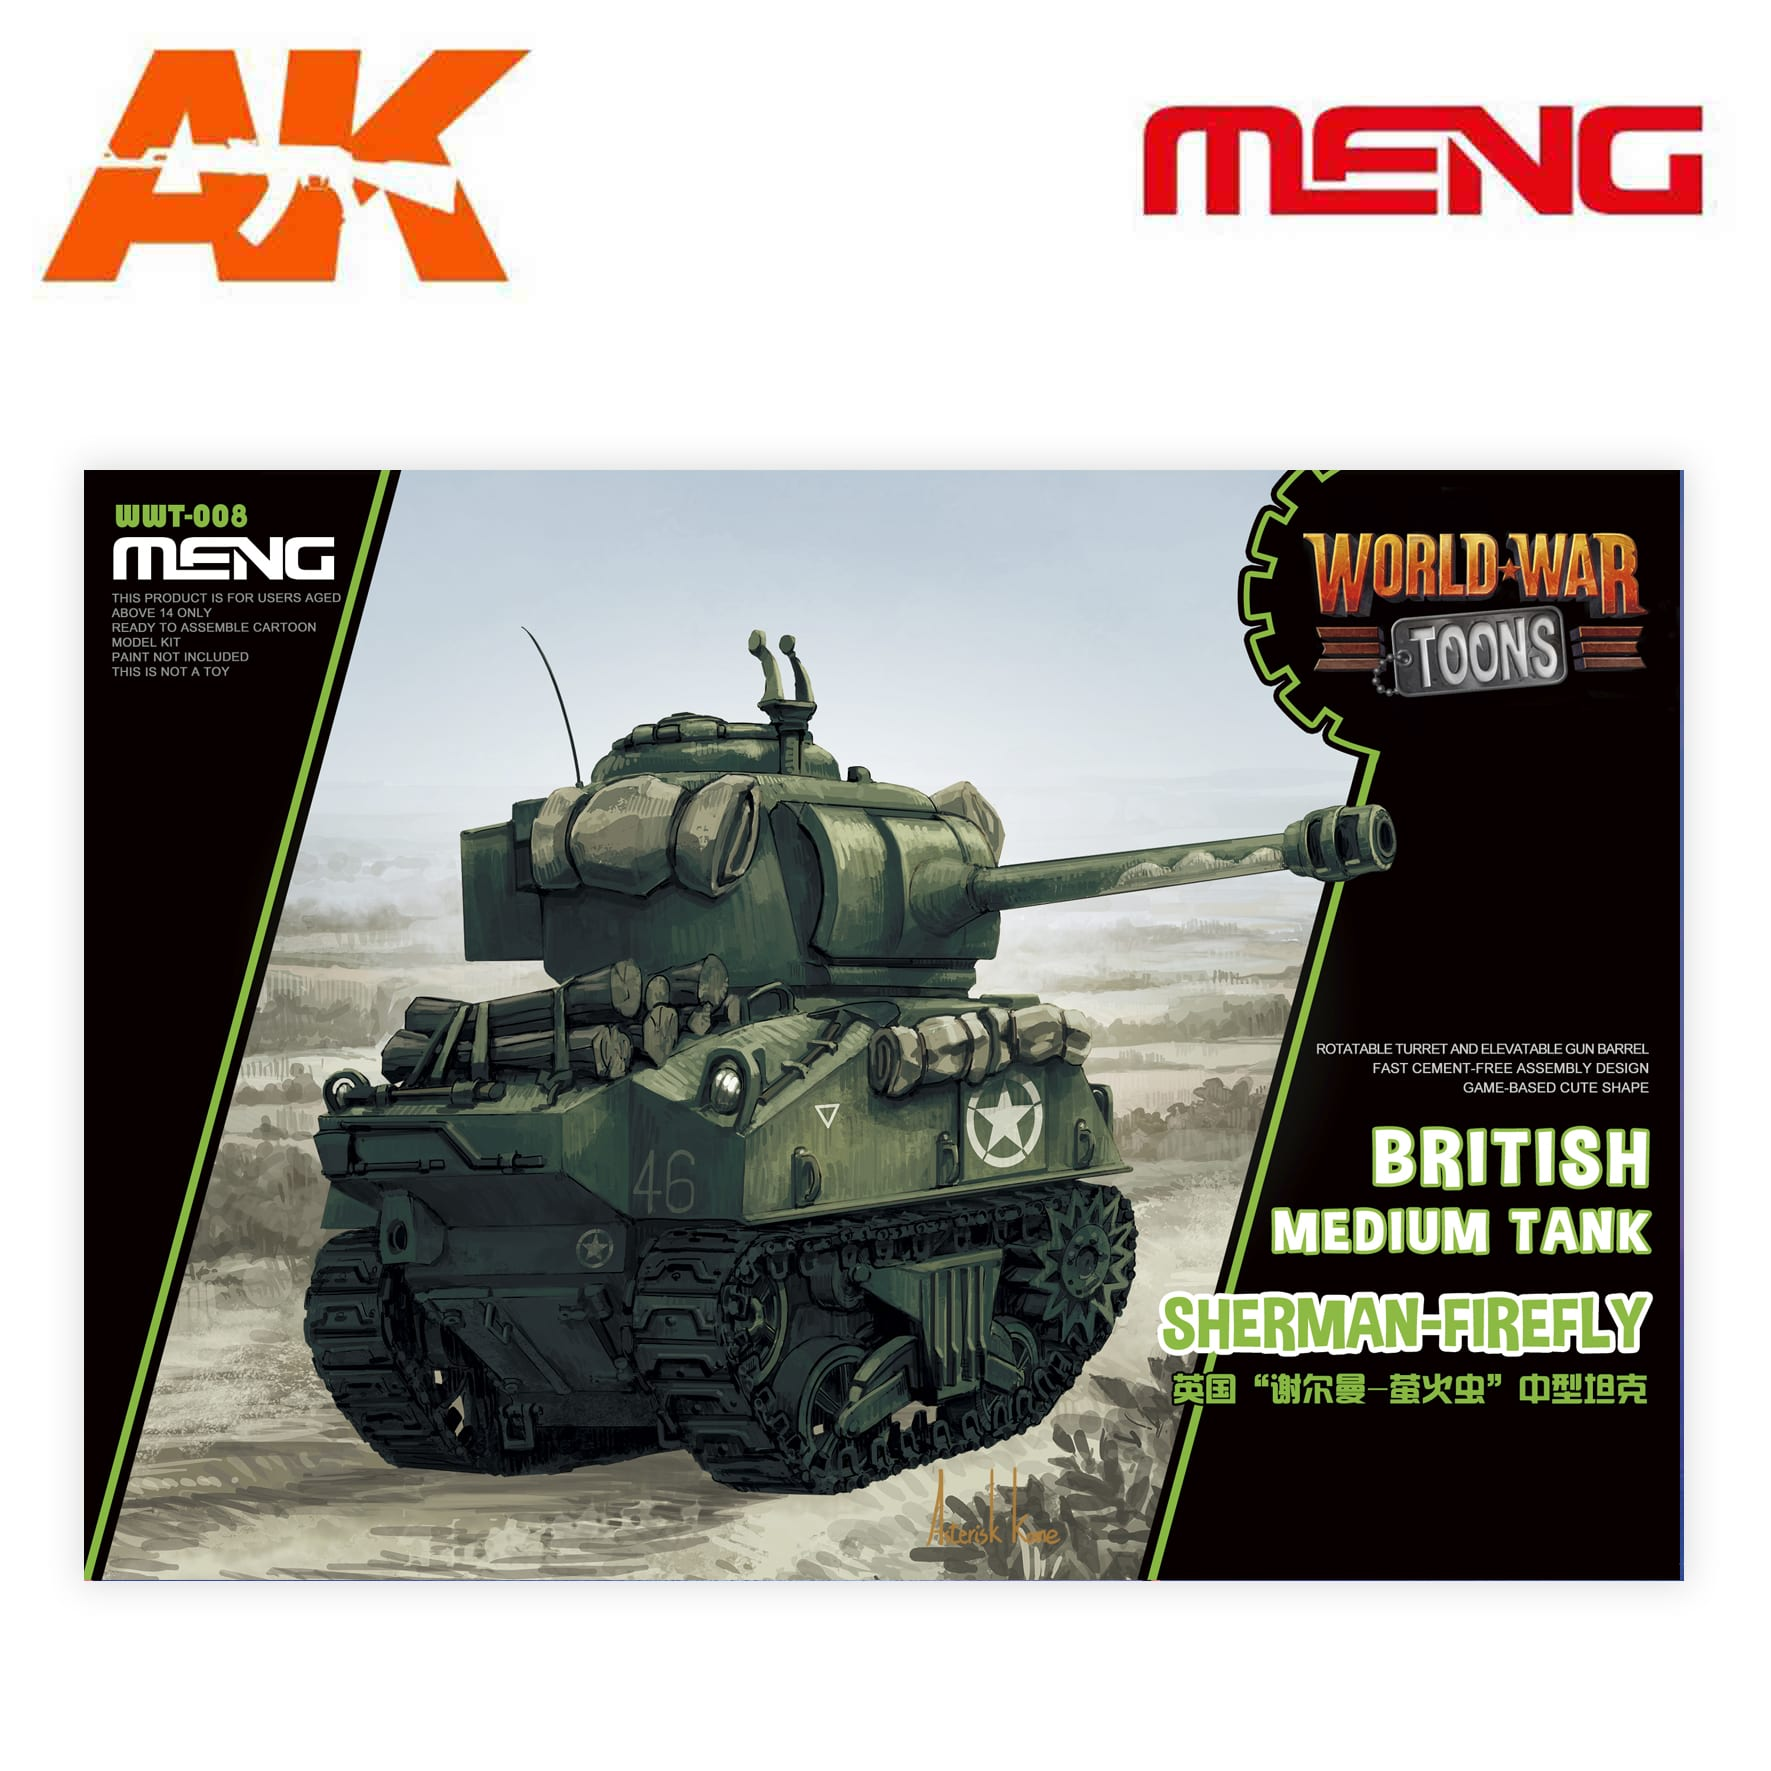 World war toons: British medium tank Sherman-Firefly (Cartoon Model)